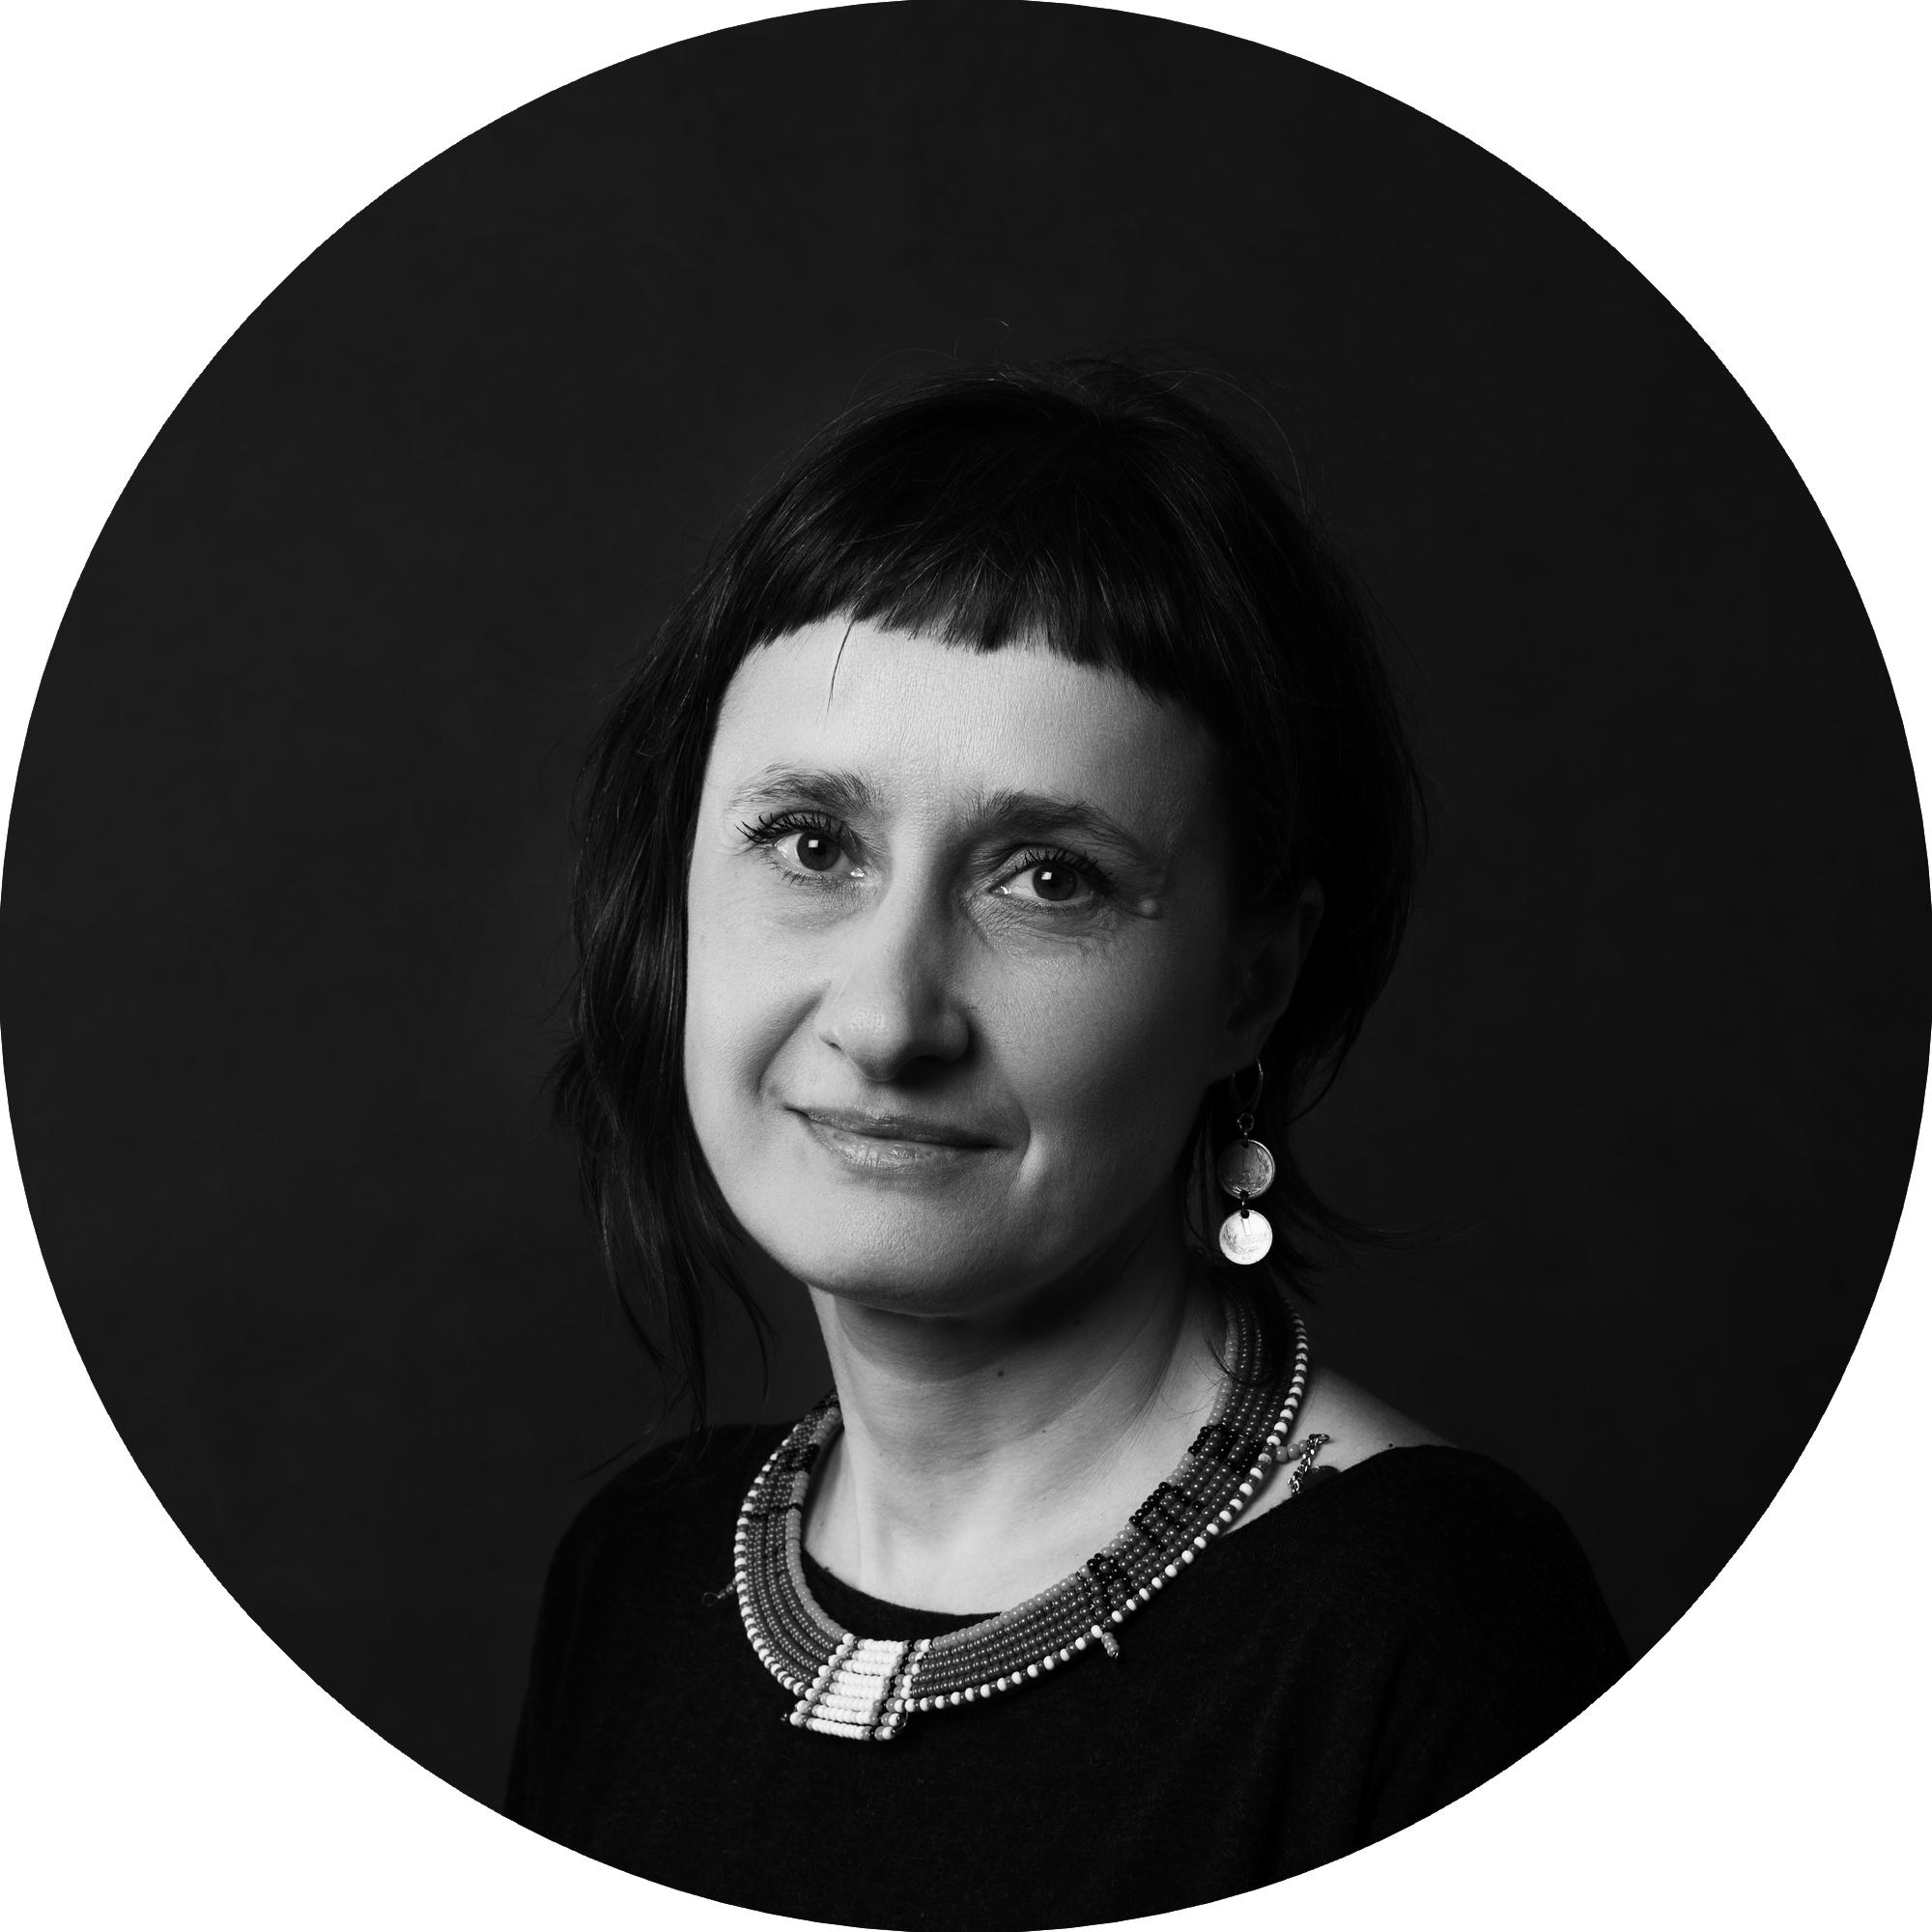 Anna Klonowska